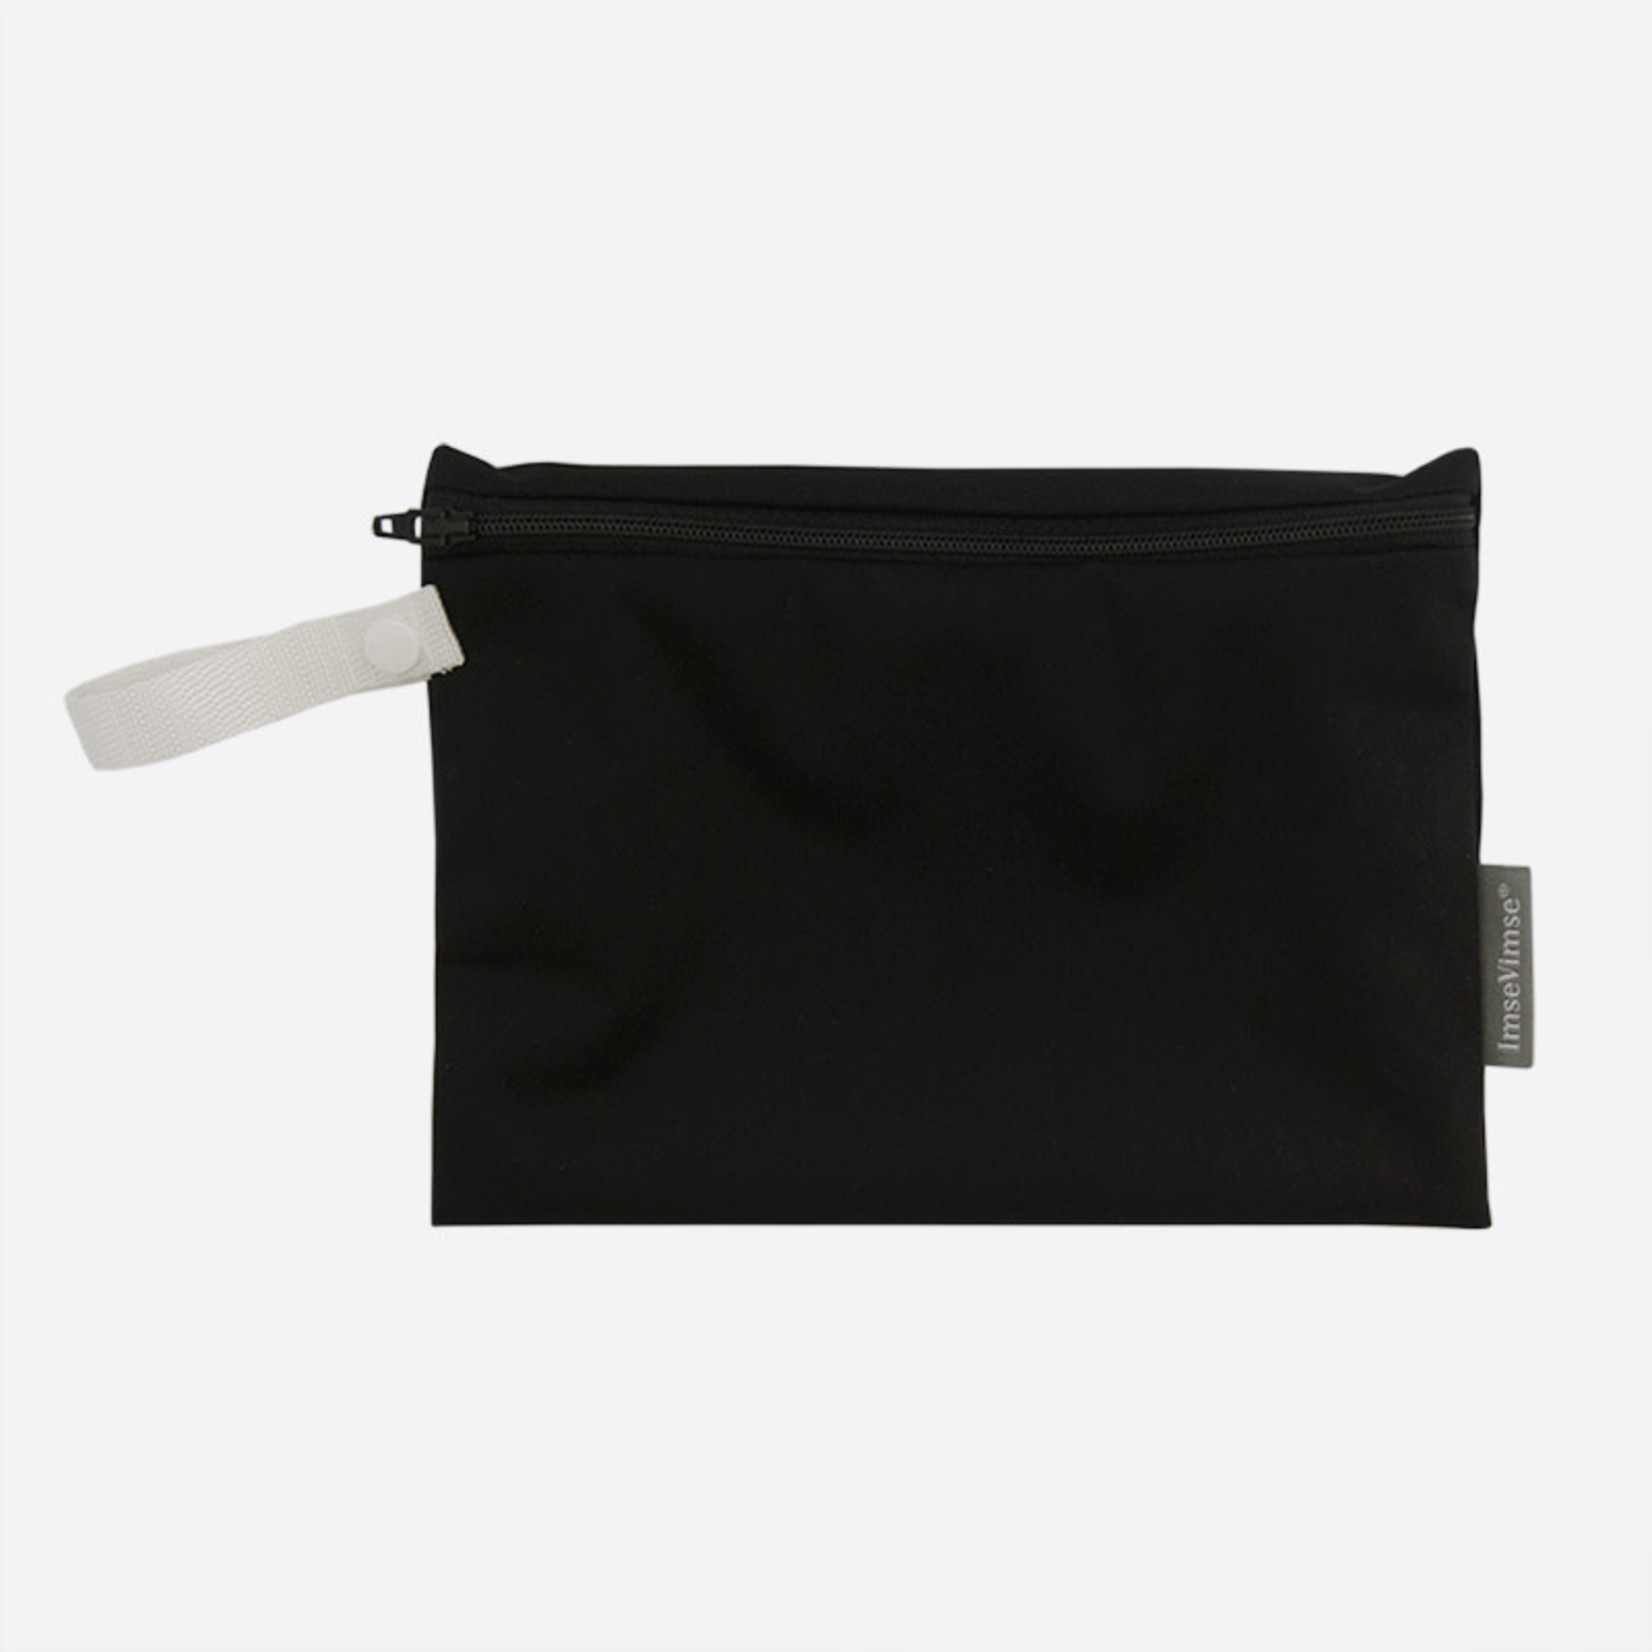 Imse Vimse Mini wetbag (Zwart)